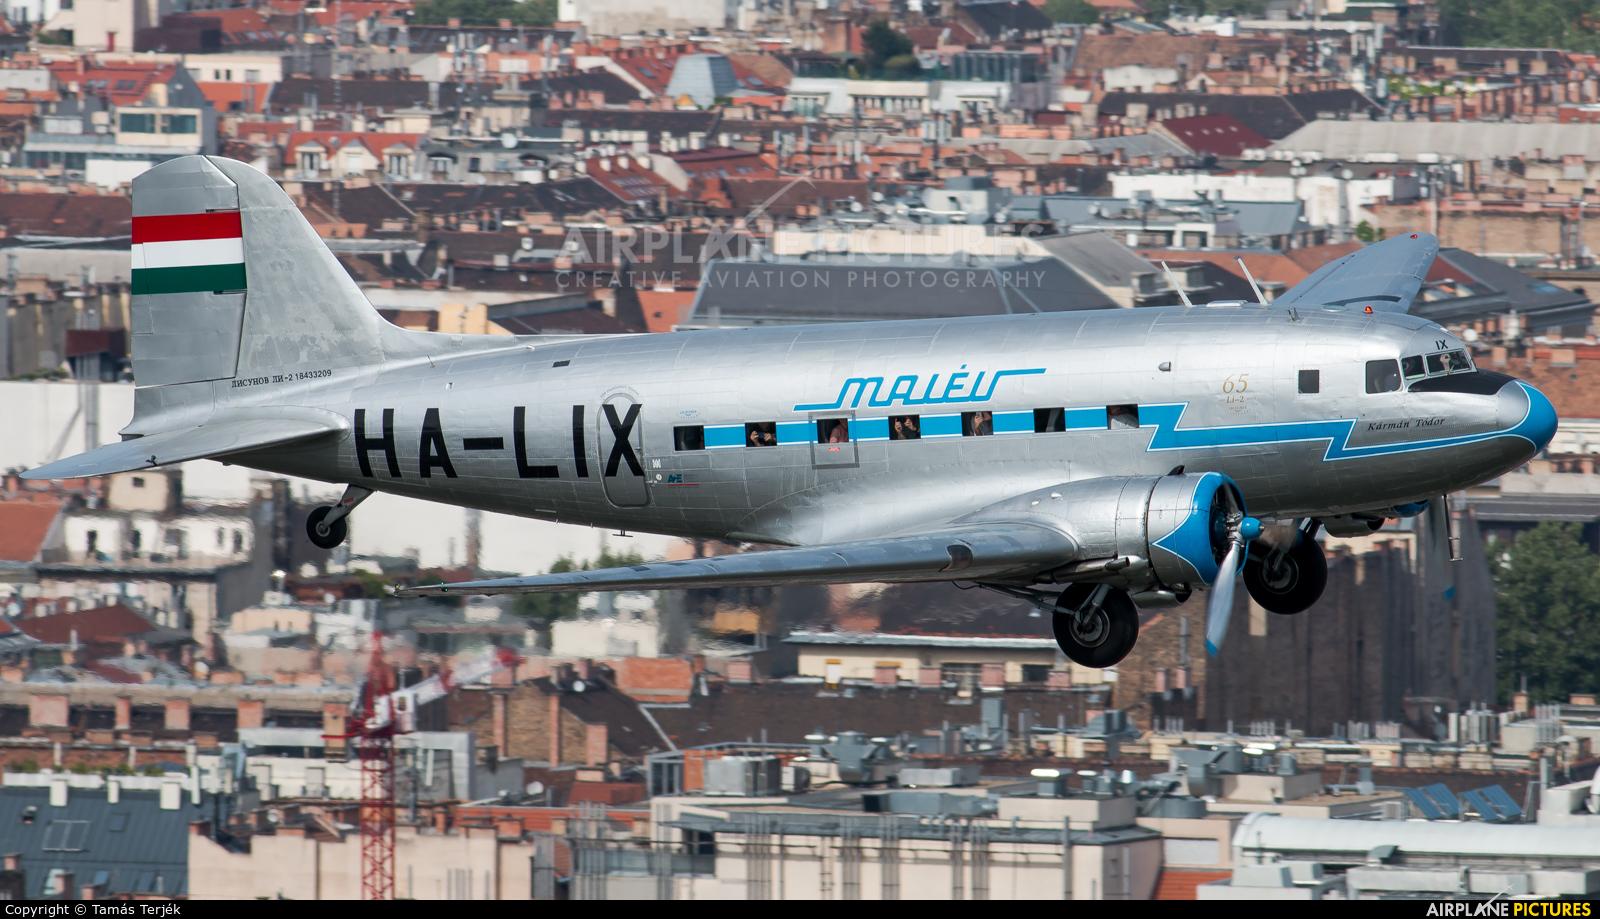 Malev Sunflower Aviation (Gold Ttimer Foundation) HA-LIX aircraft at In Flight - Hungary